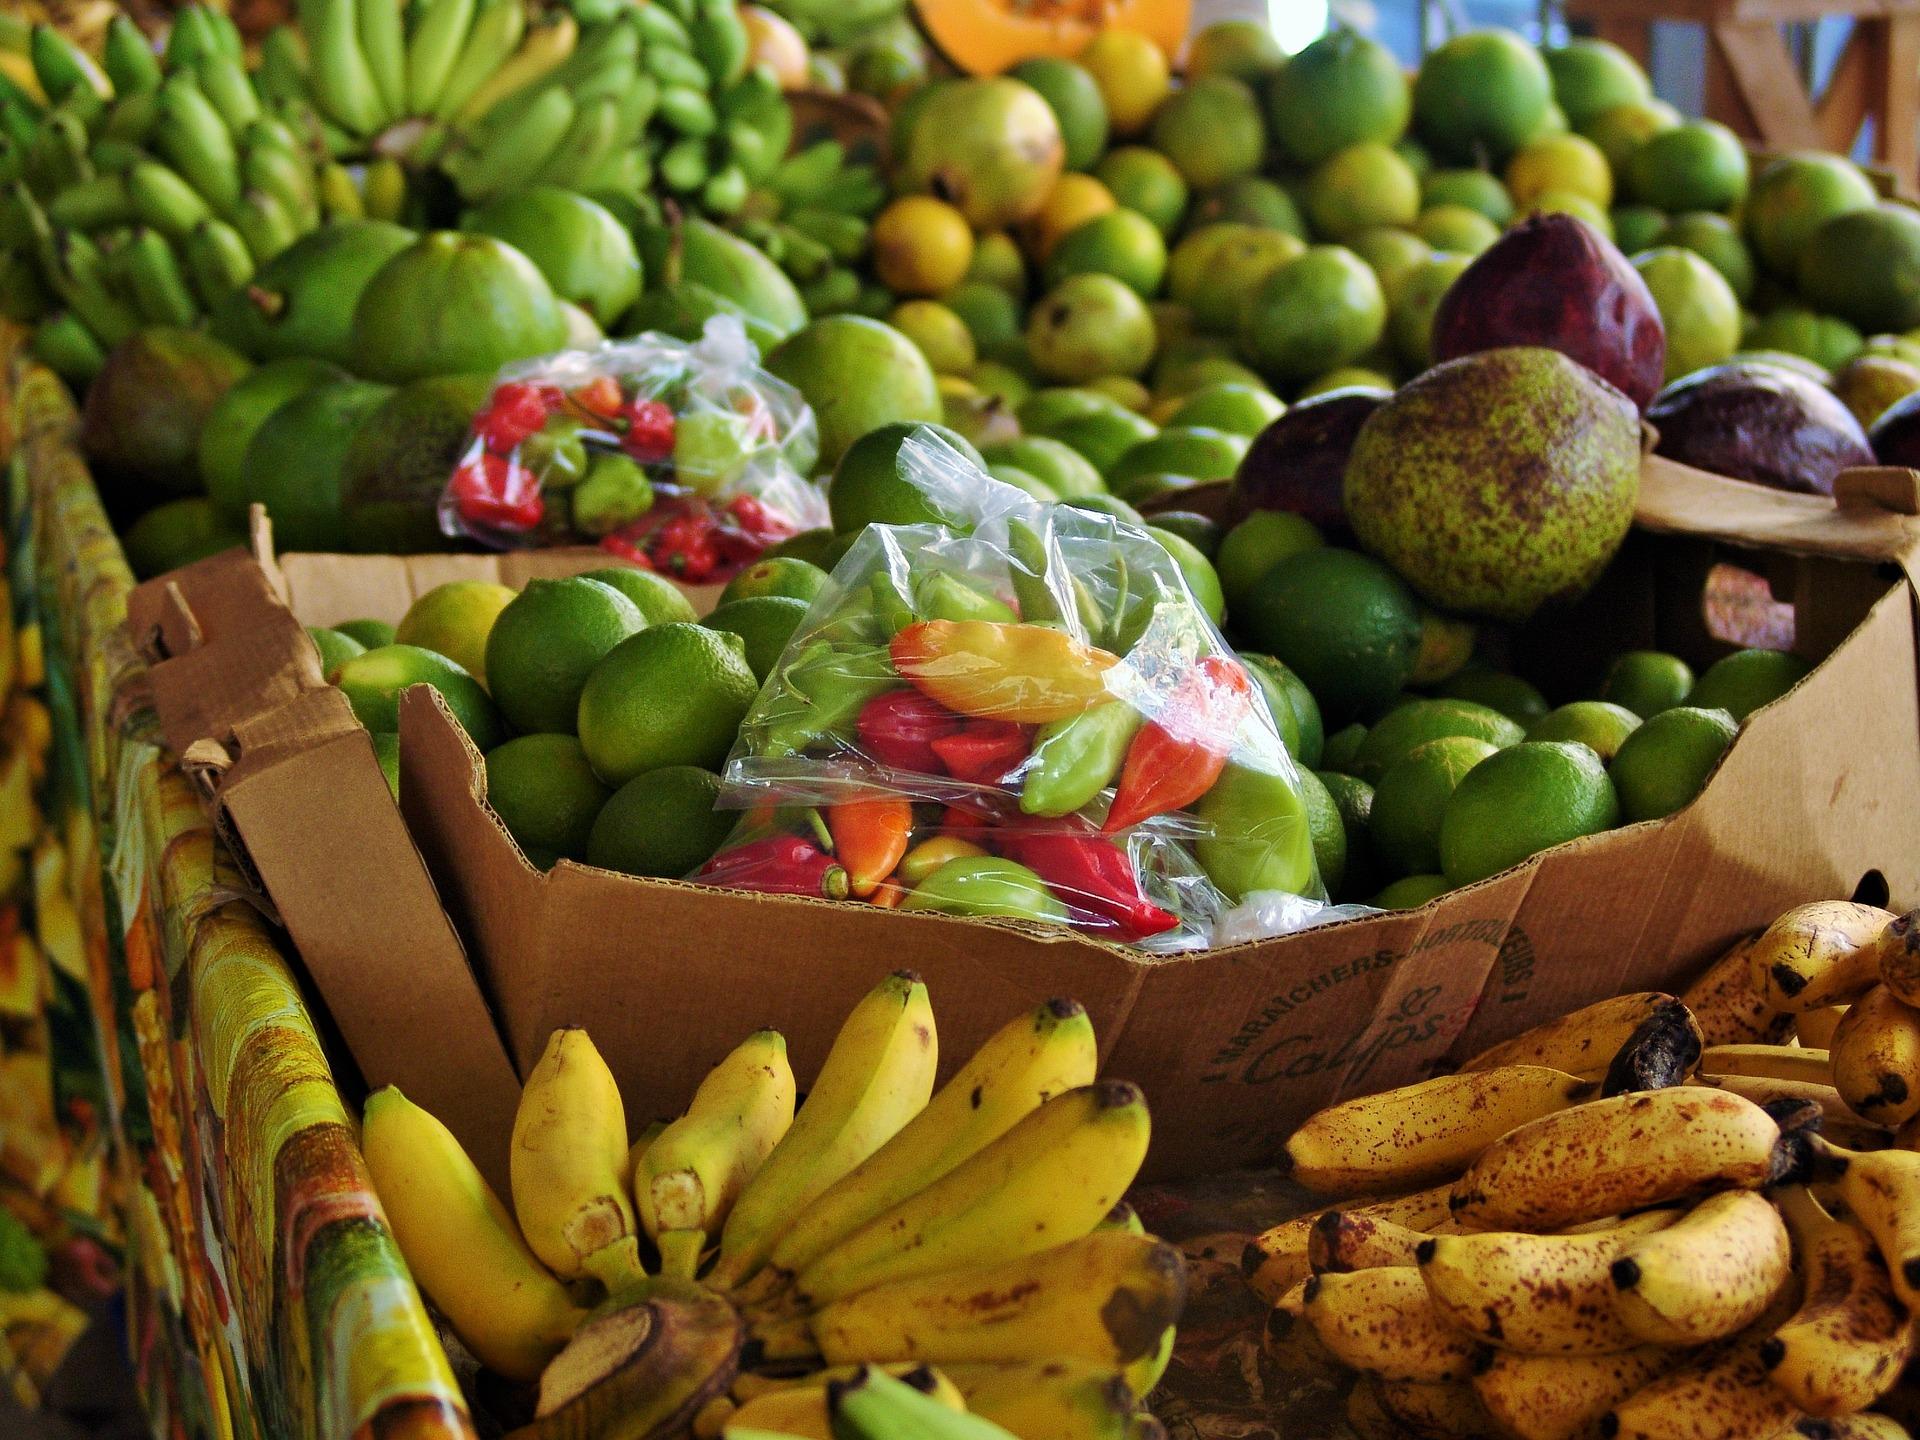 Fruit market in the Caribbean